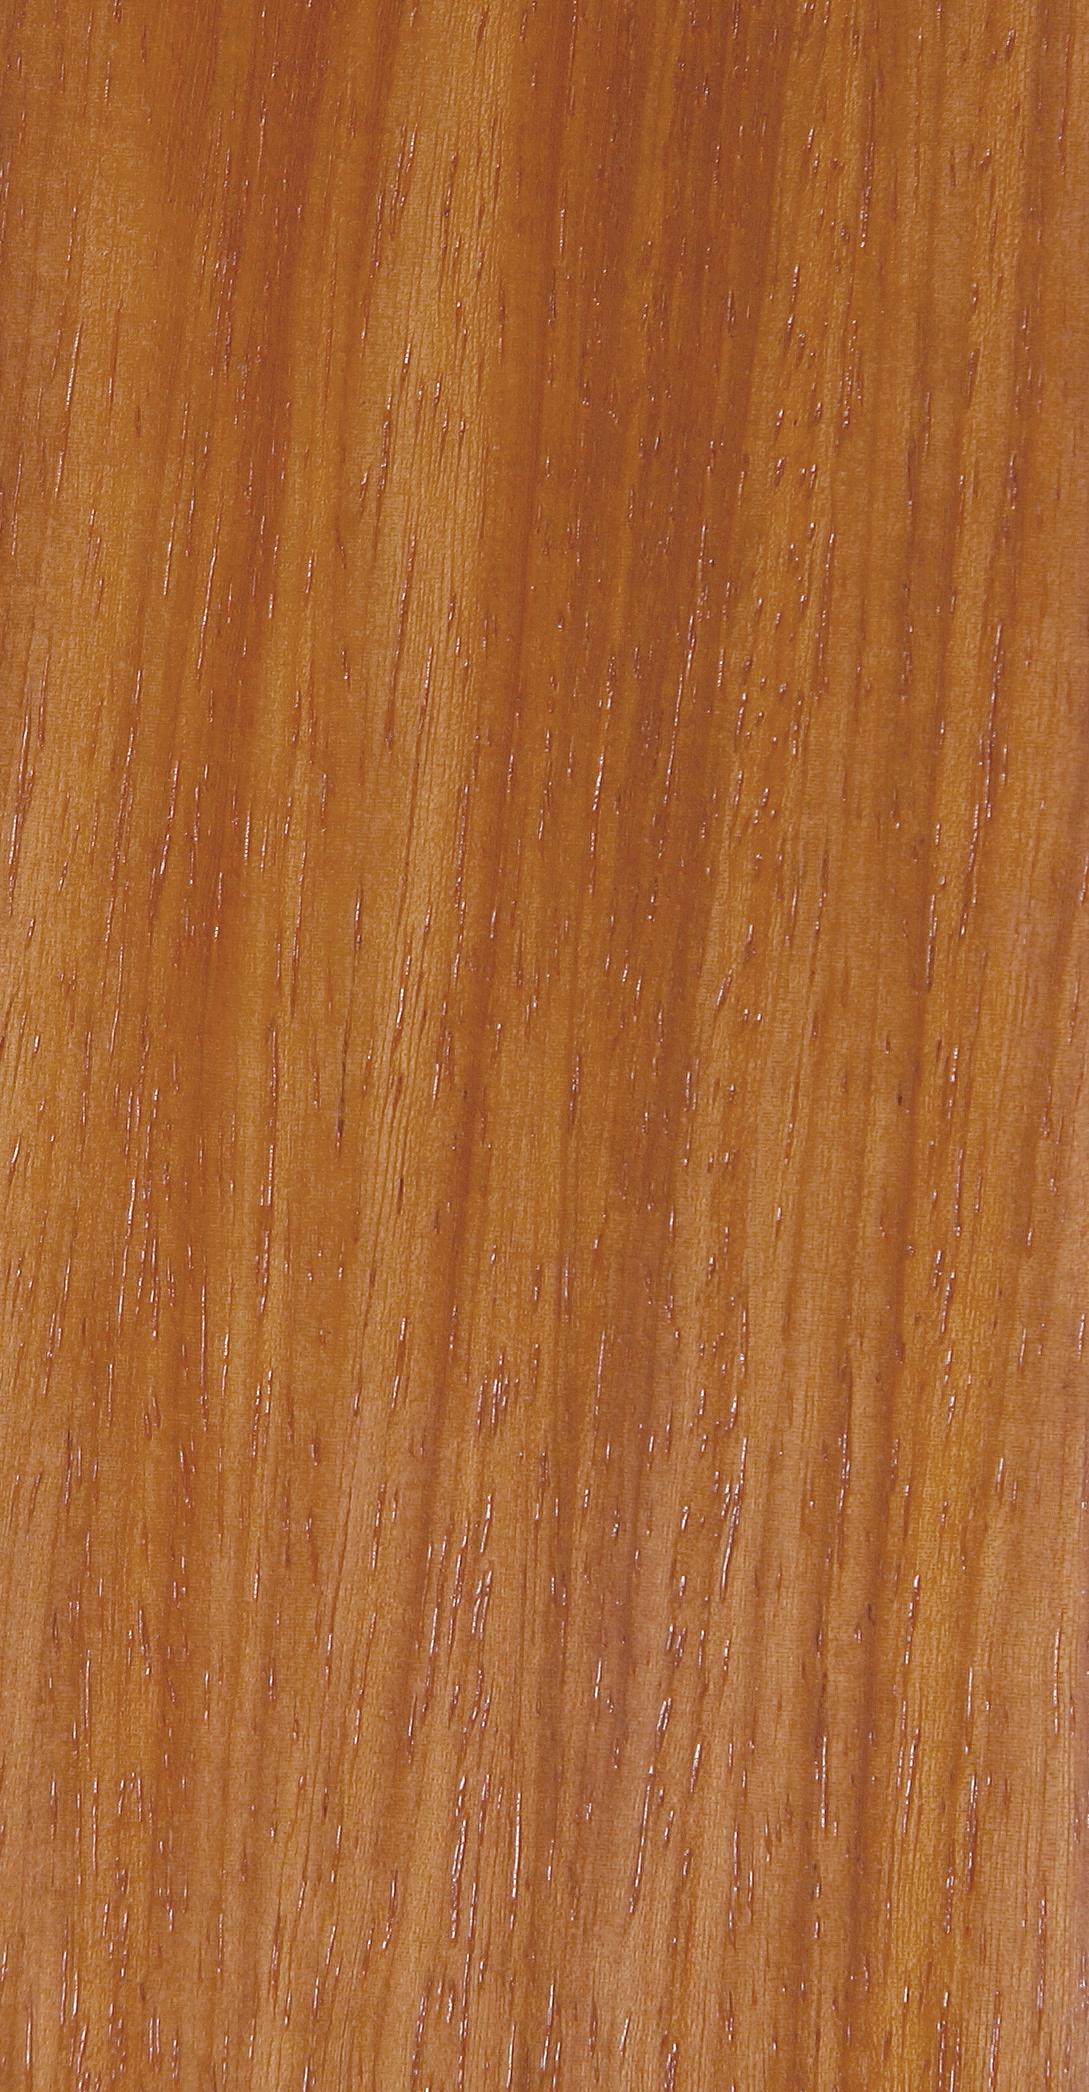 New Guinea Rosewood